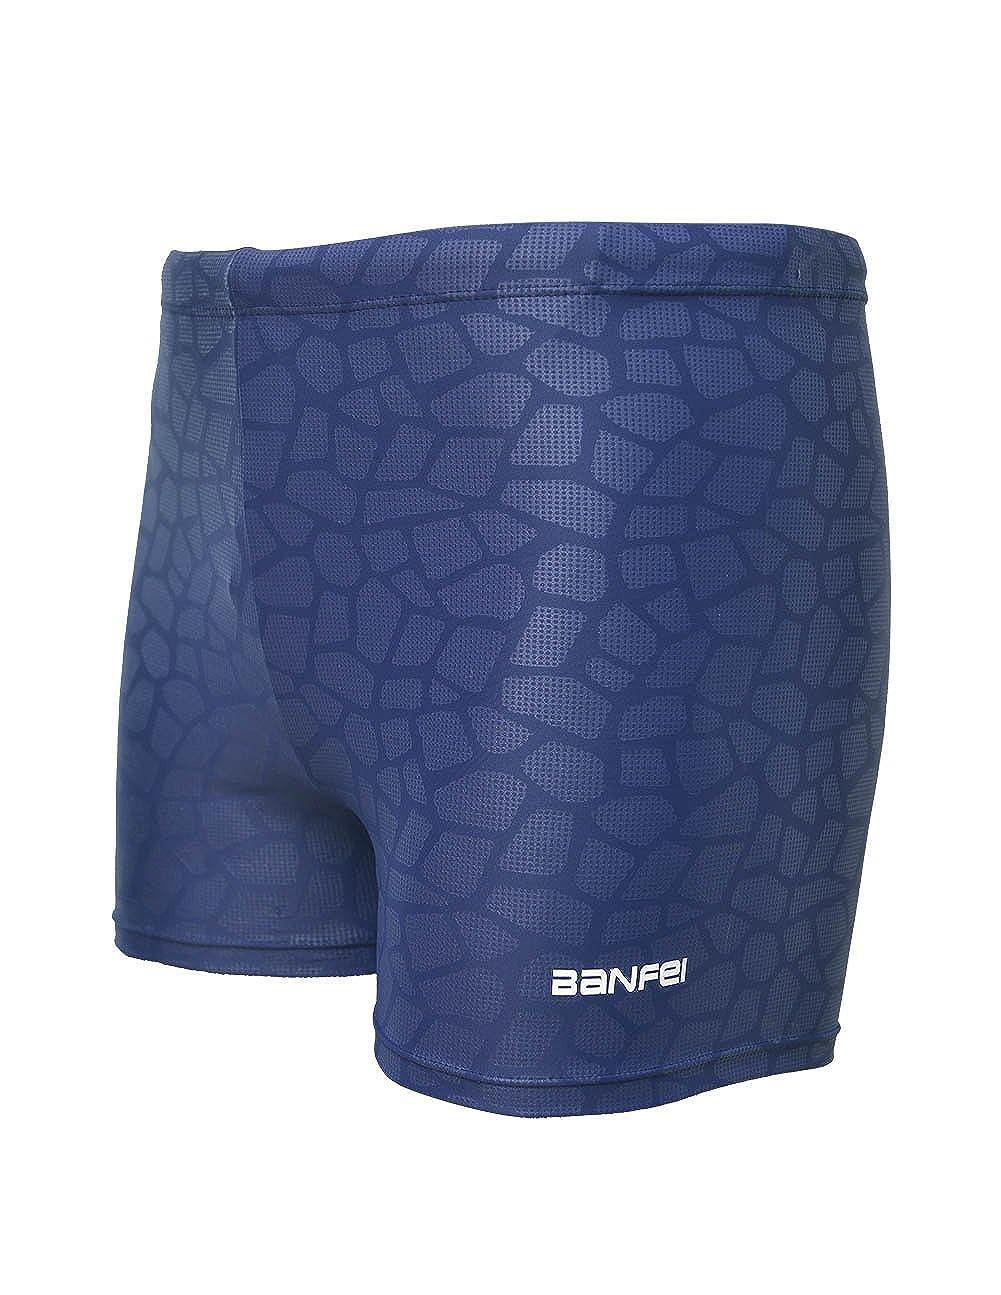 Srnfean Men`s Print Quick Dry Square Leg Swimsuit Swim Trunks banfei03